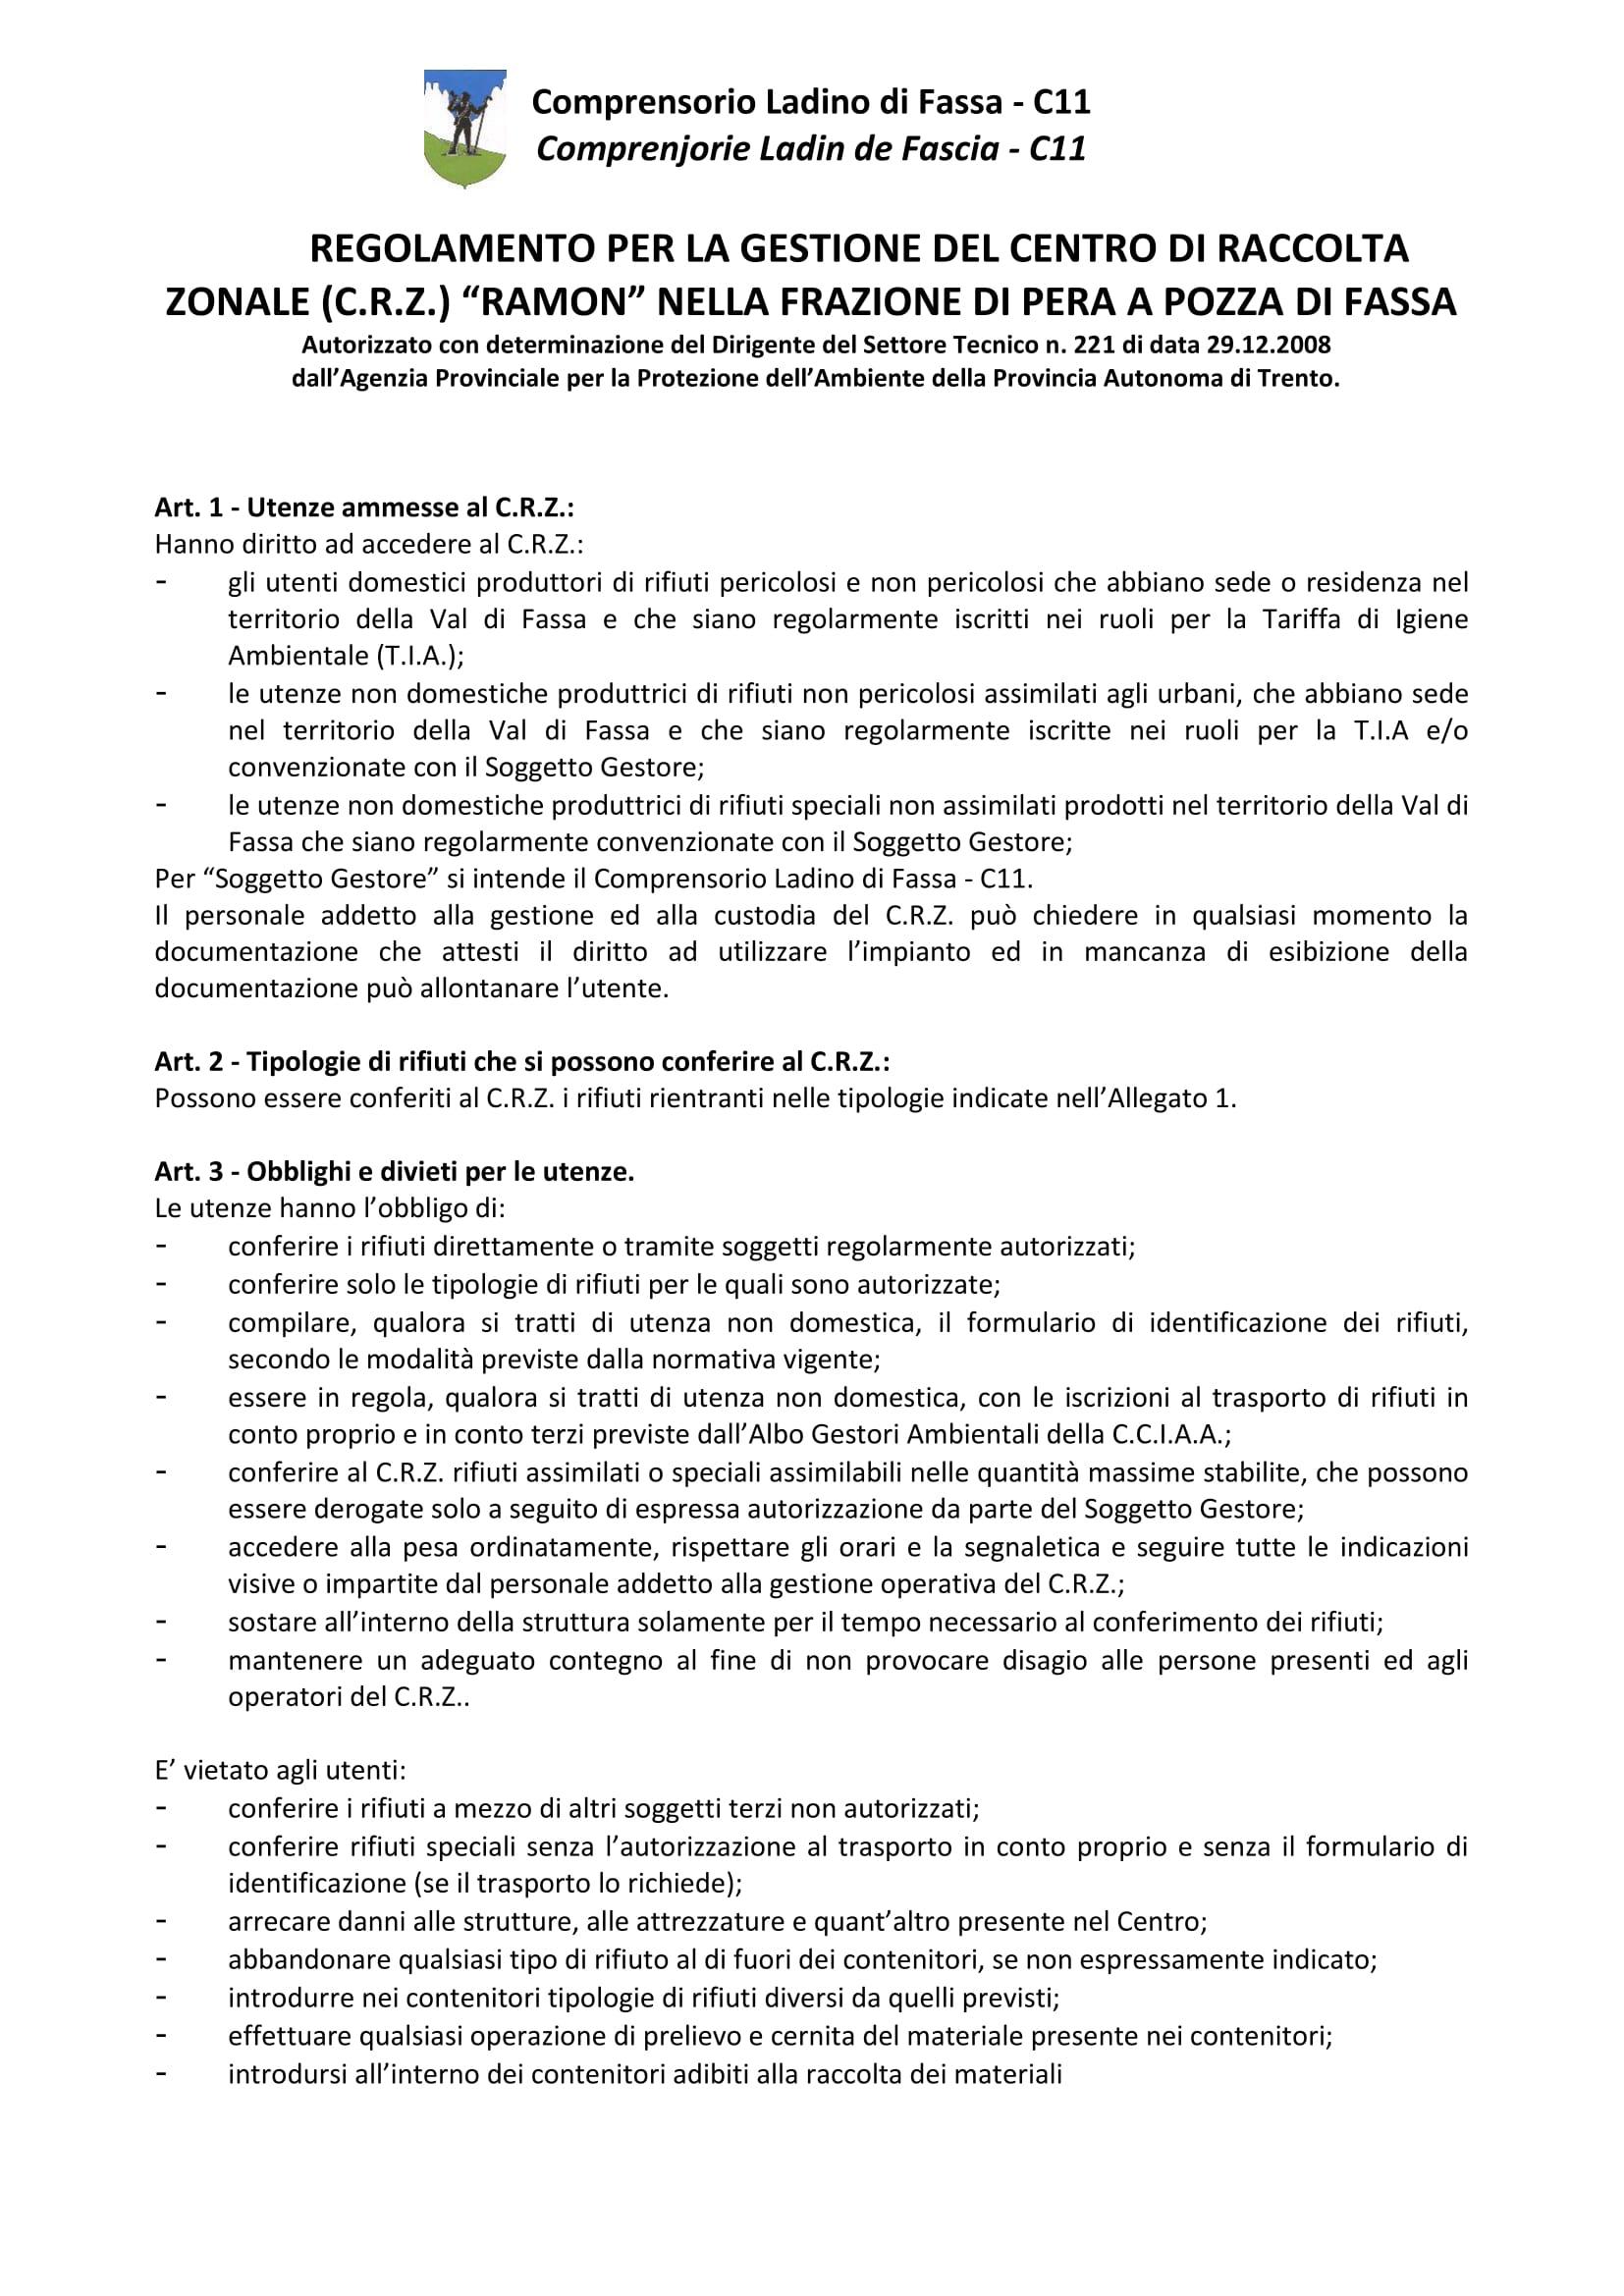 Prima pagina del regolamento CRZ